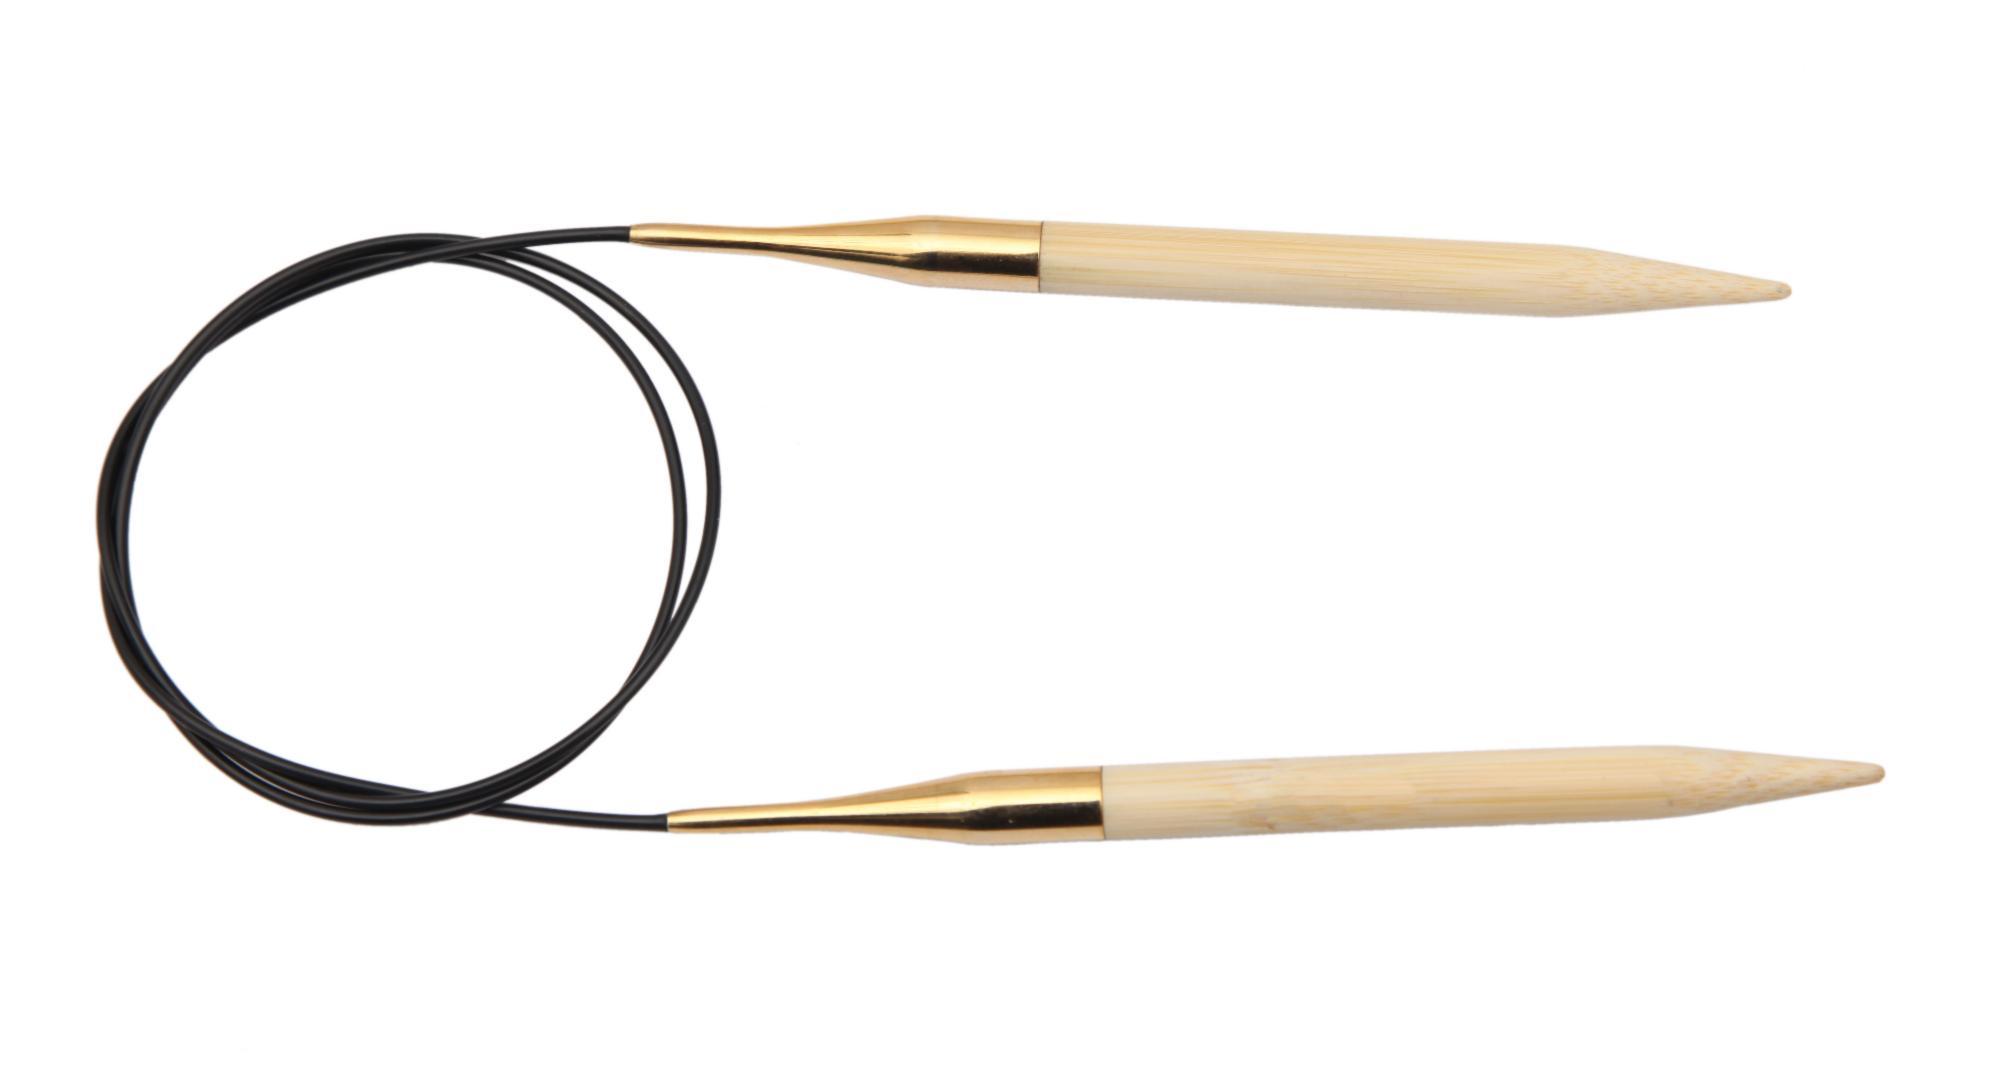 Спицы круговые 100 см Bamboo KnitPro, 22276, 10.00 мм